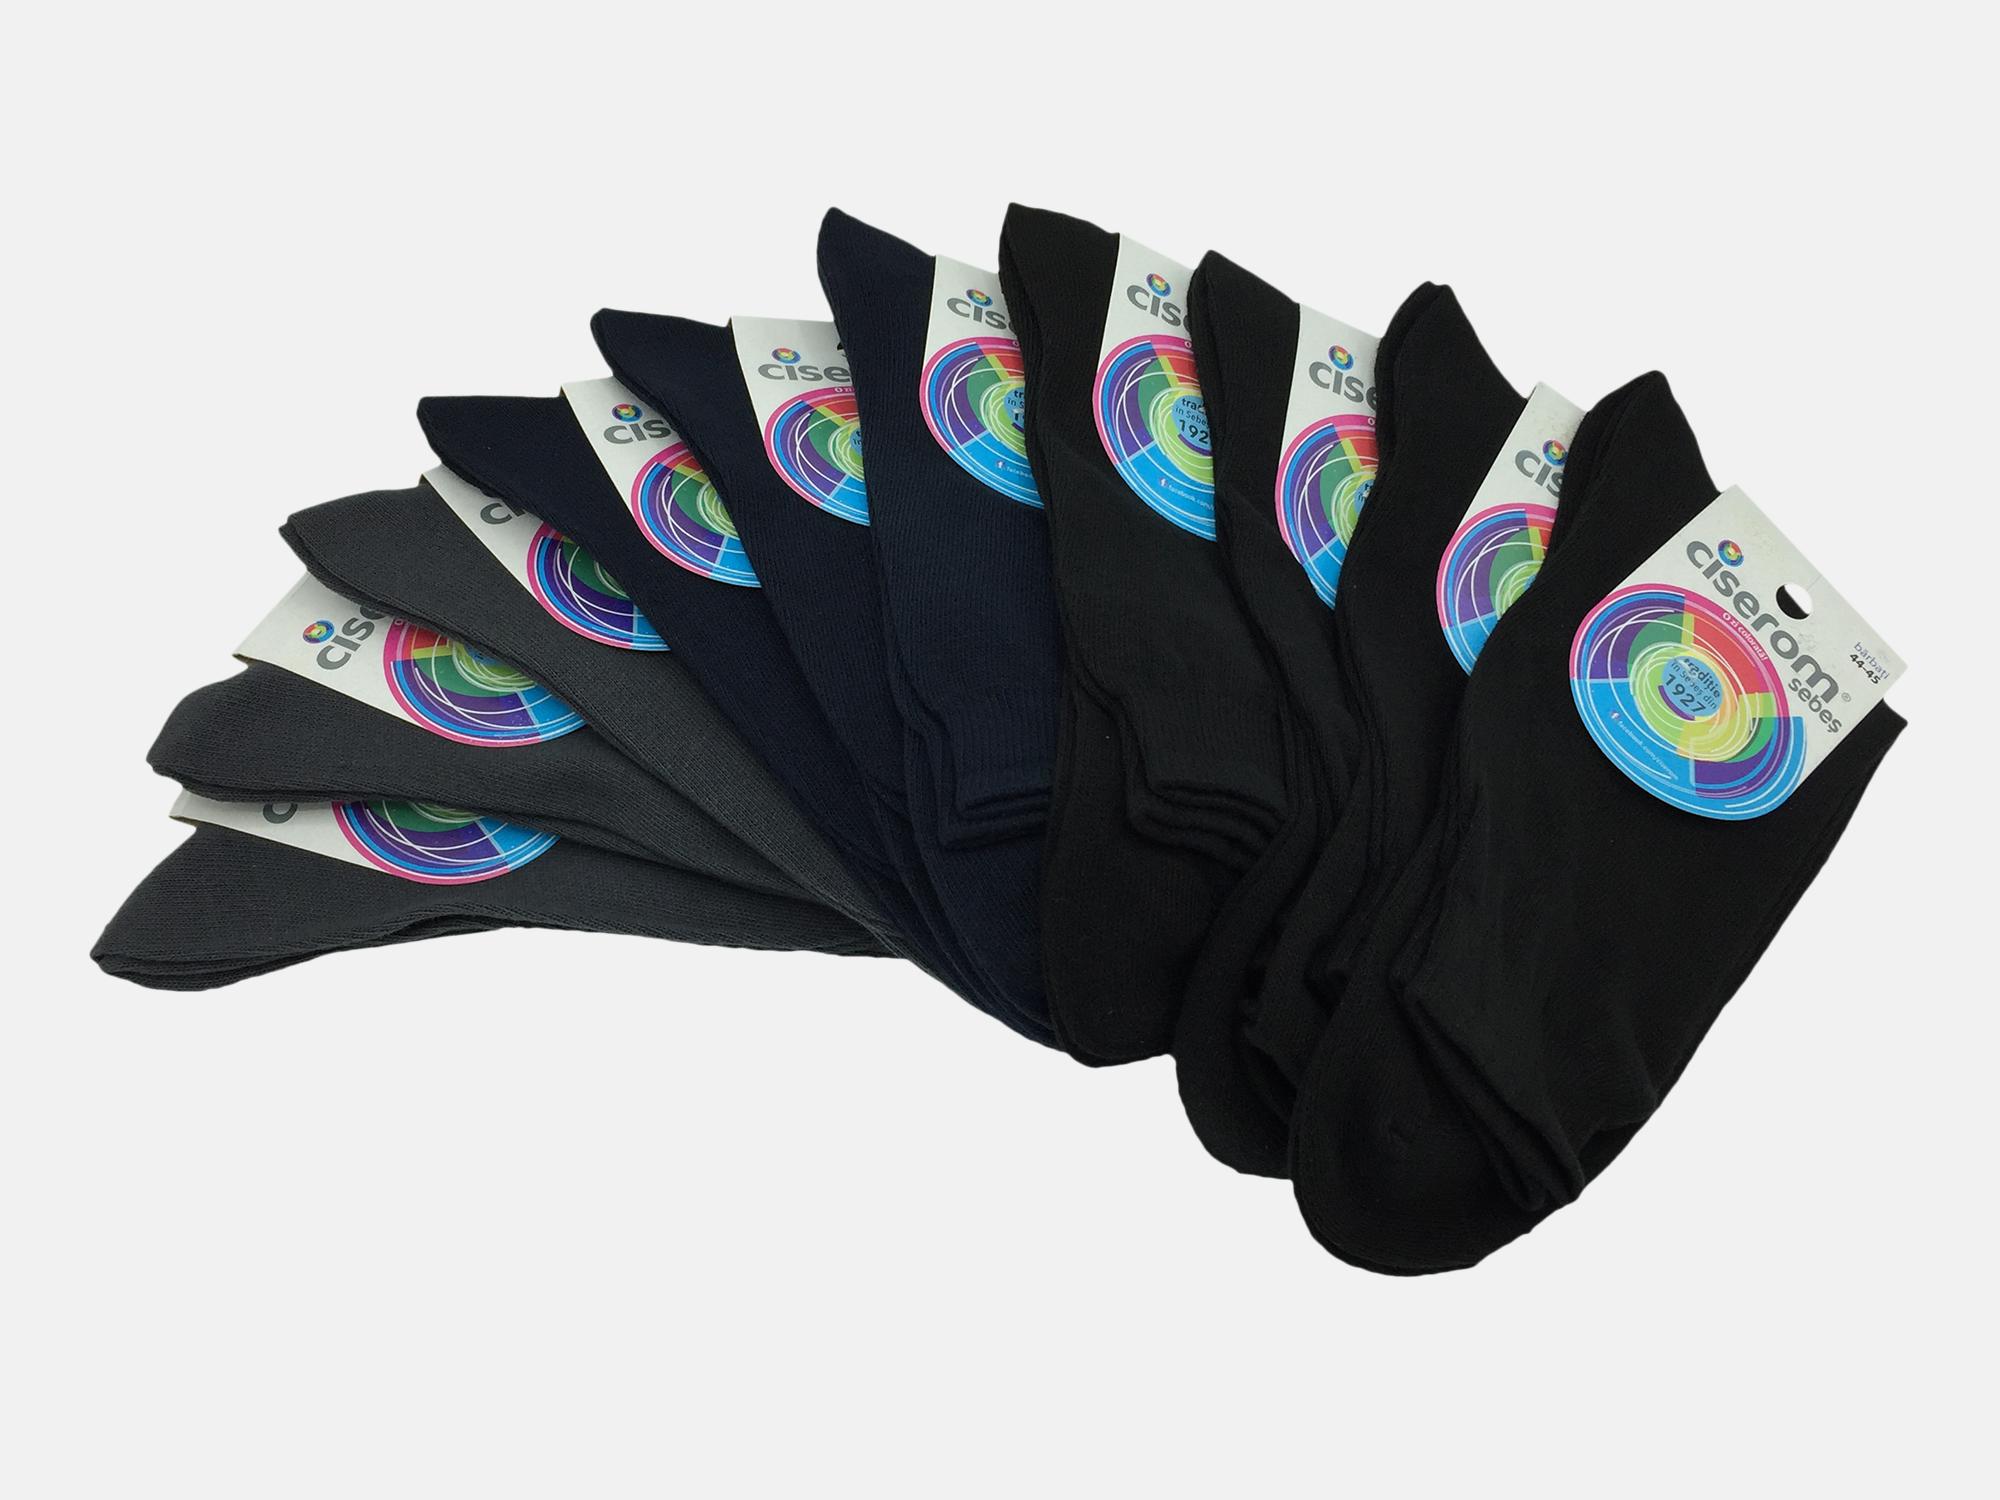 Sosete barbati 100% Bumbac - Multicolor - set 10 perechi - Ciserom 400